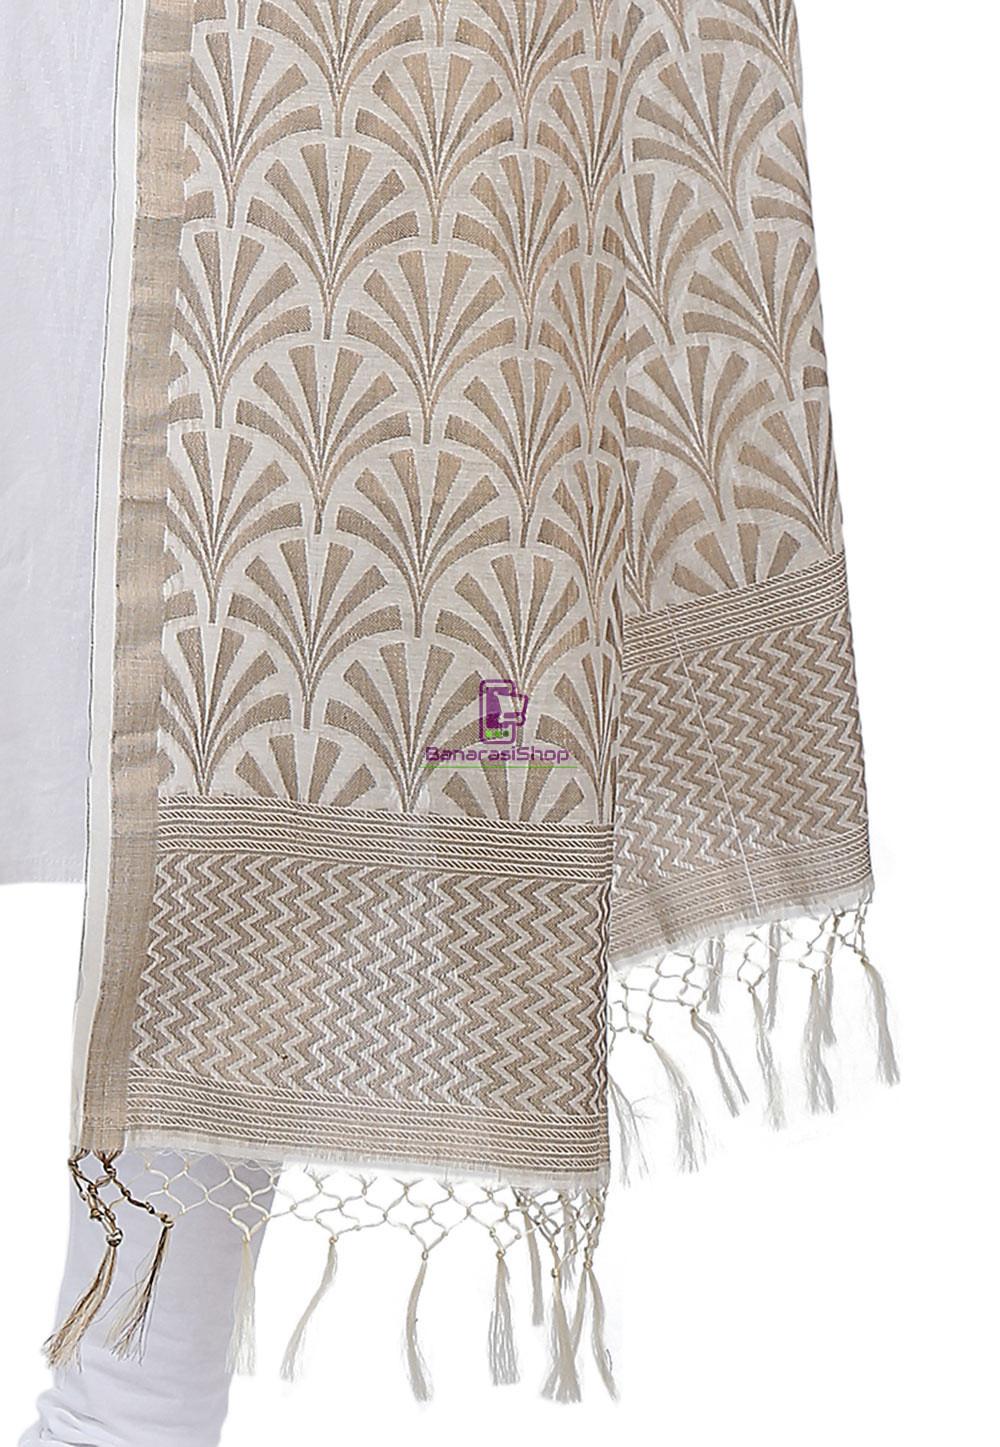 Woven Banarasi Cotton Silk Jacquard Dupatta in Off White 3